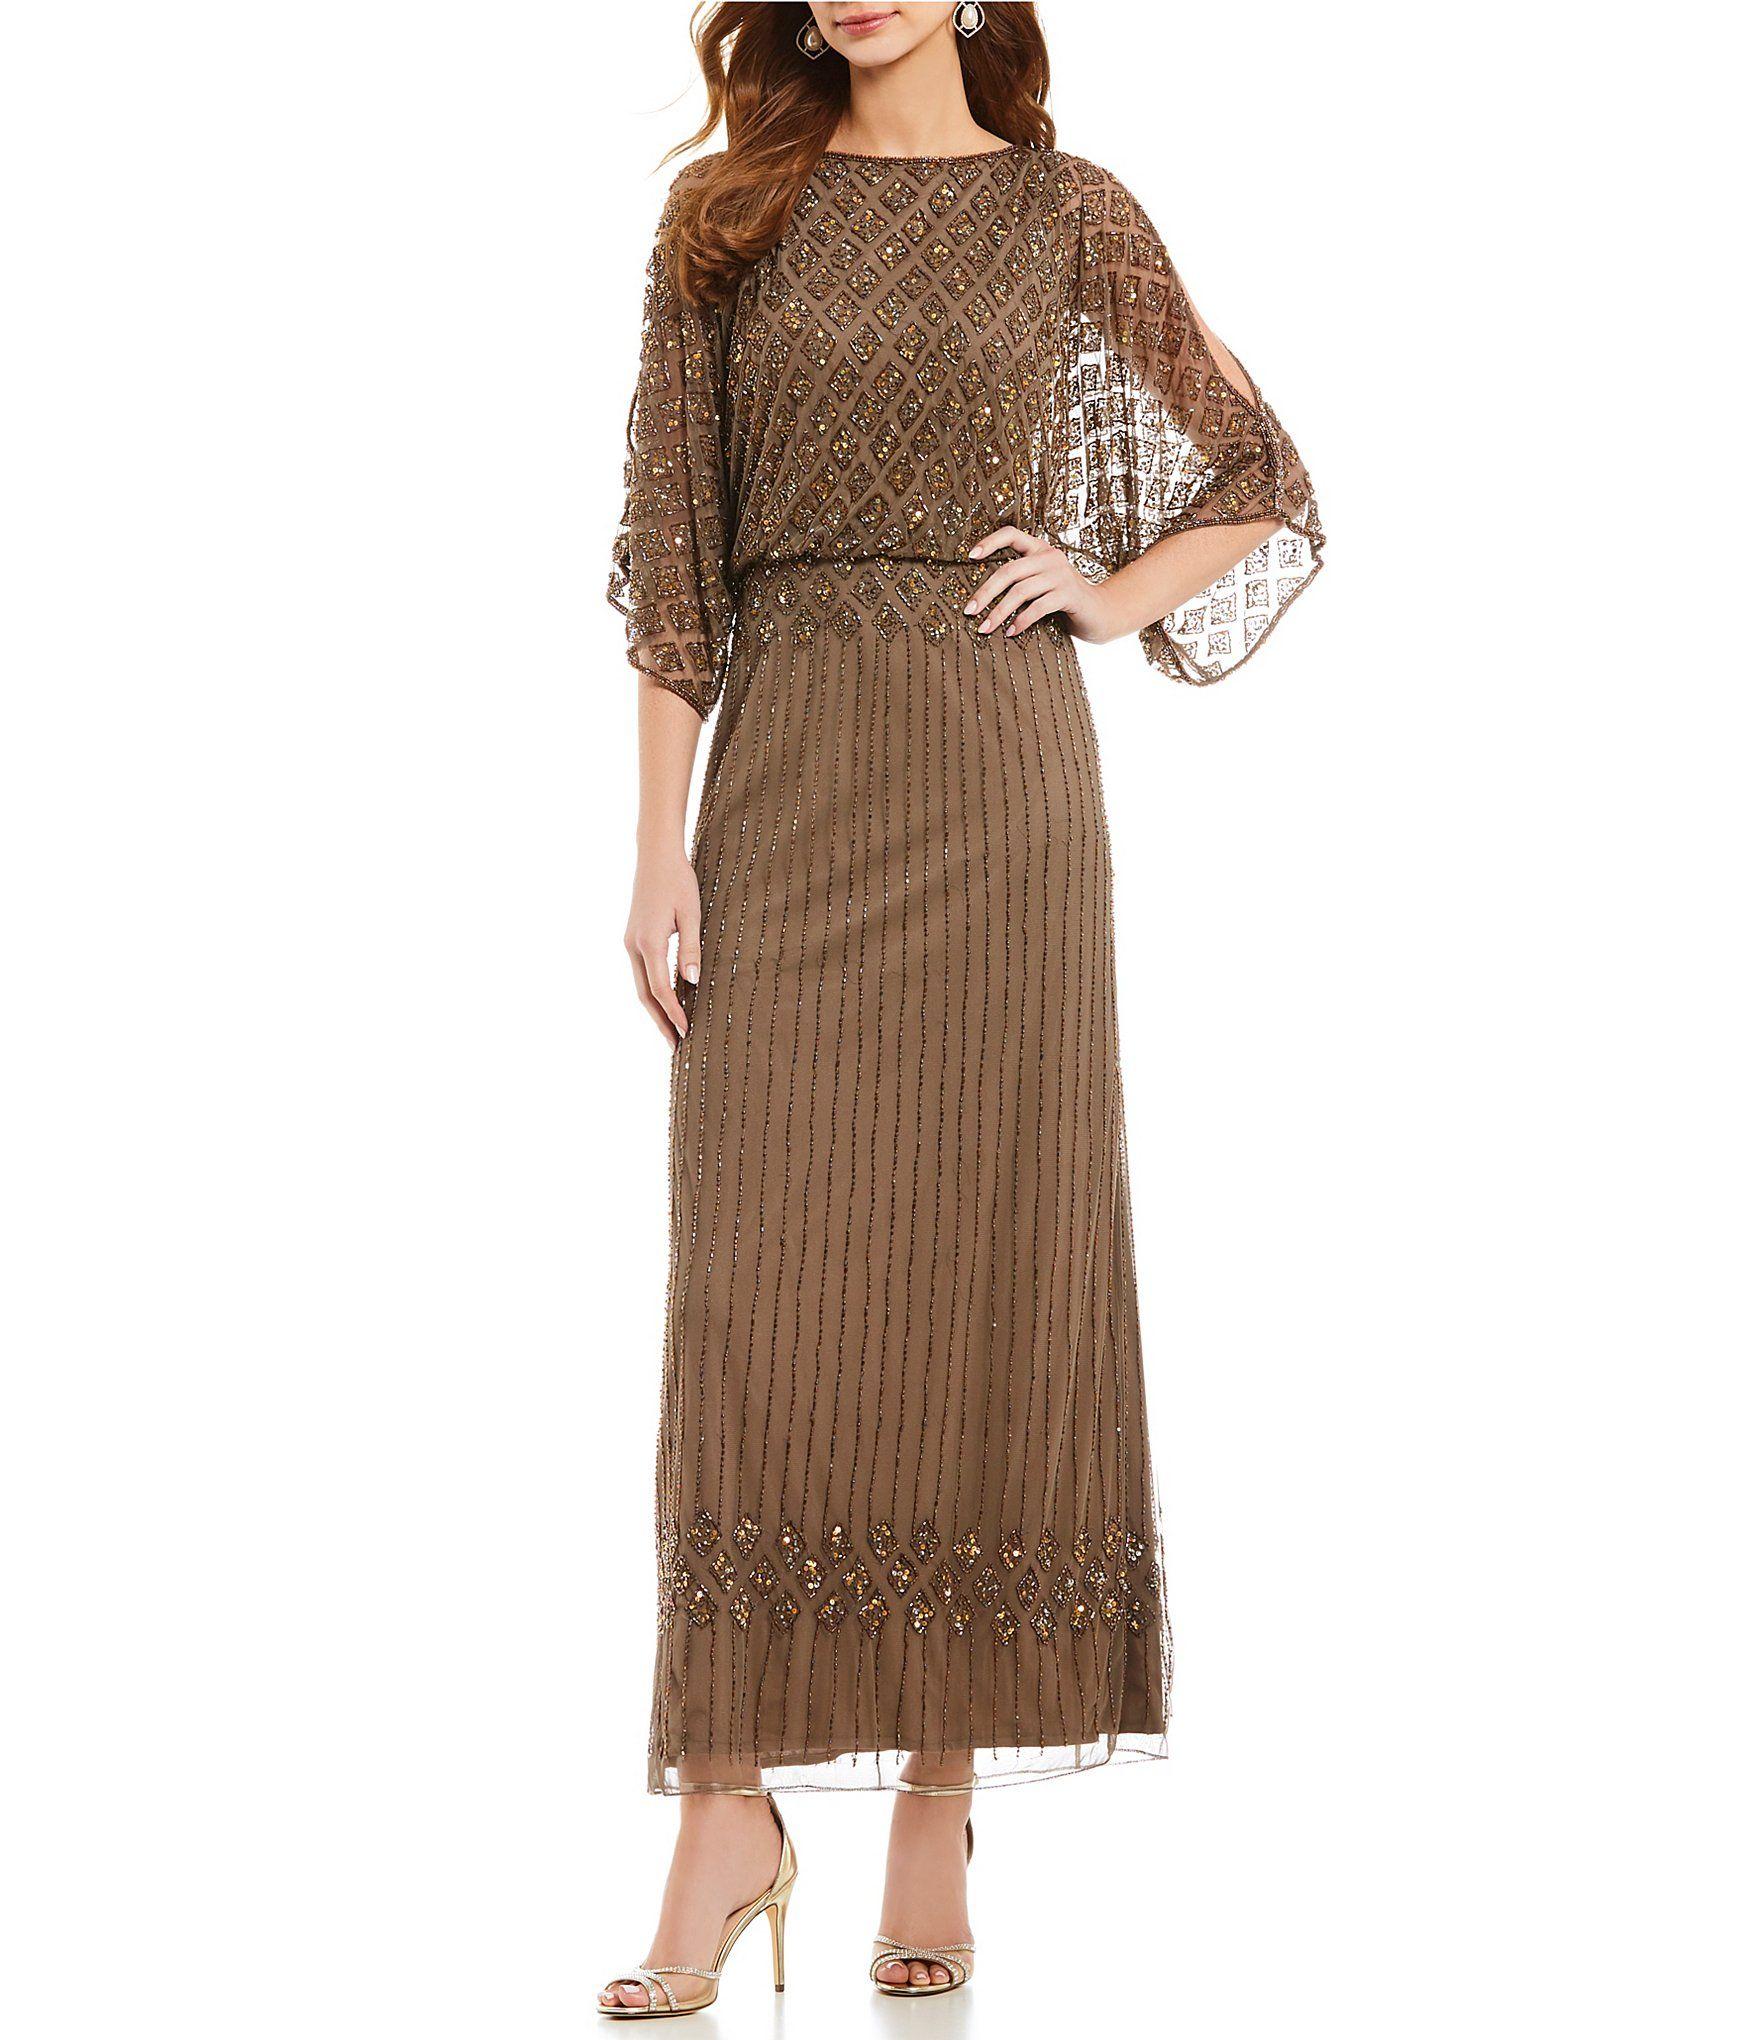 Wedding dresses dillards  Pisarro Nights Beaded Bodice Blouson Gown  Fashion  Pinterest